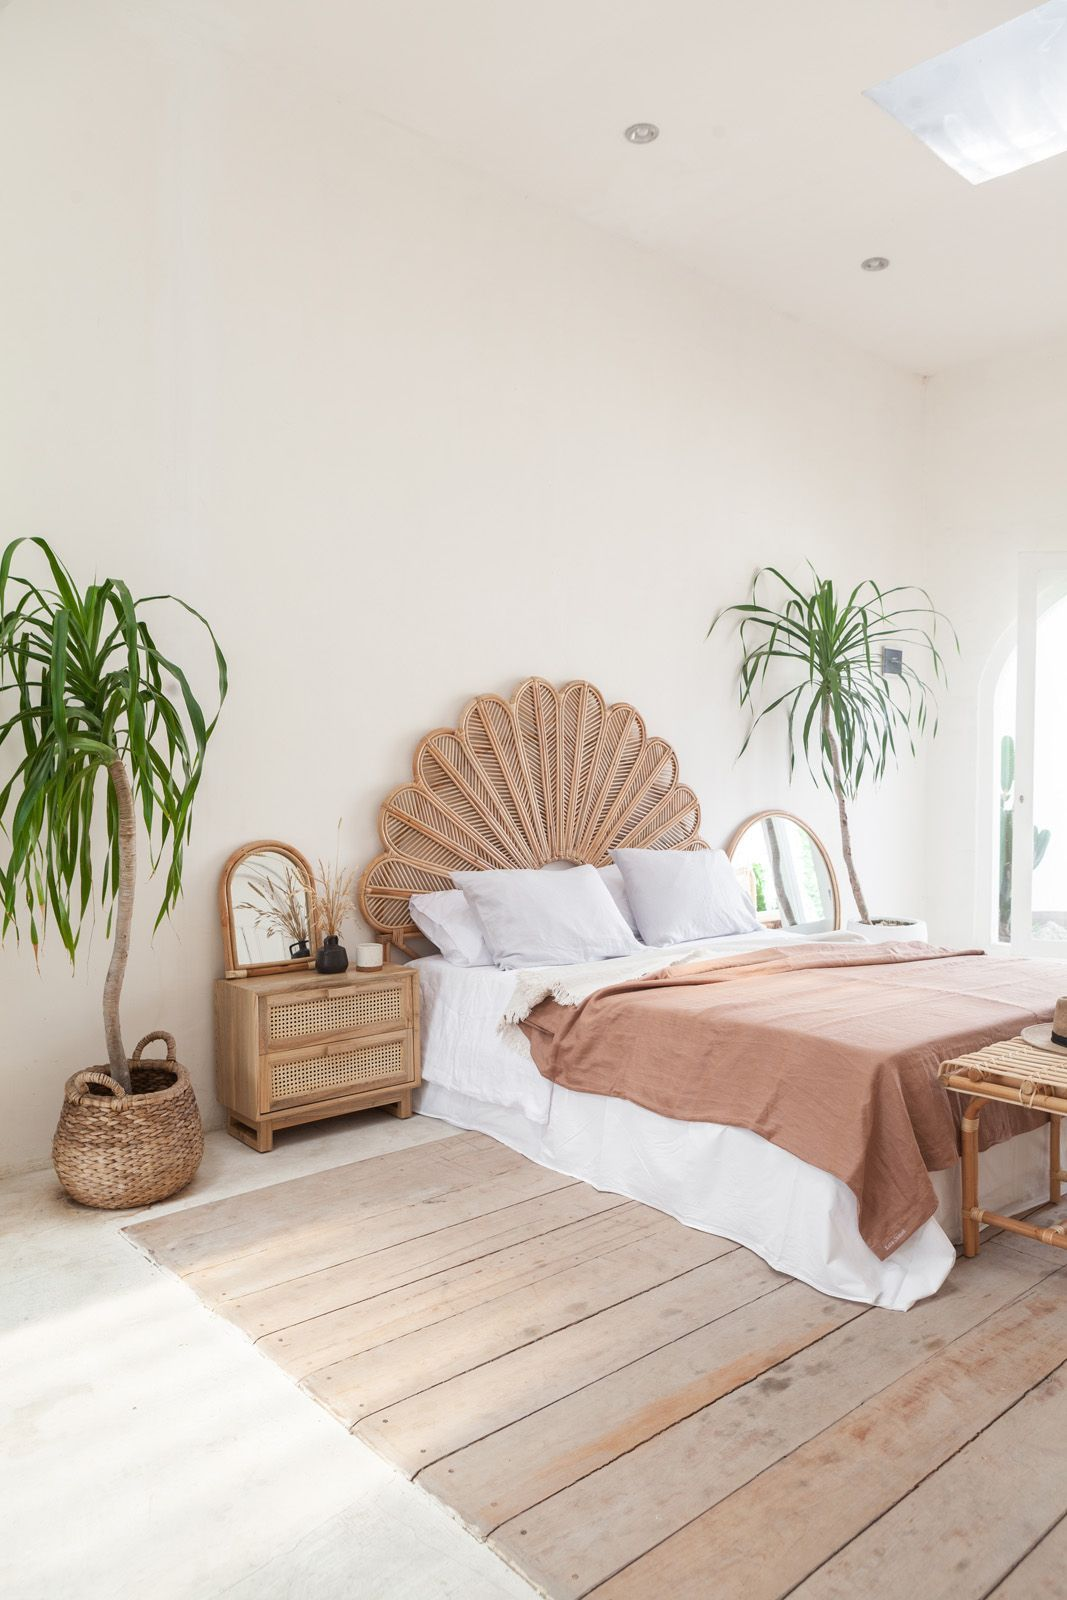 Koko Collective In 2020 Interior Bedroom Inspirations Interior Design